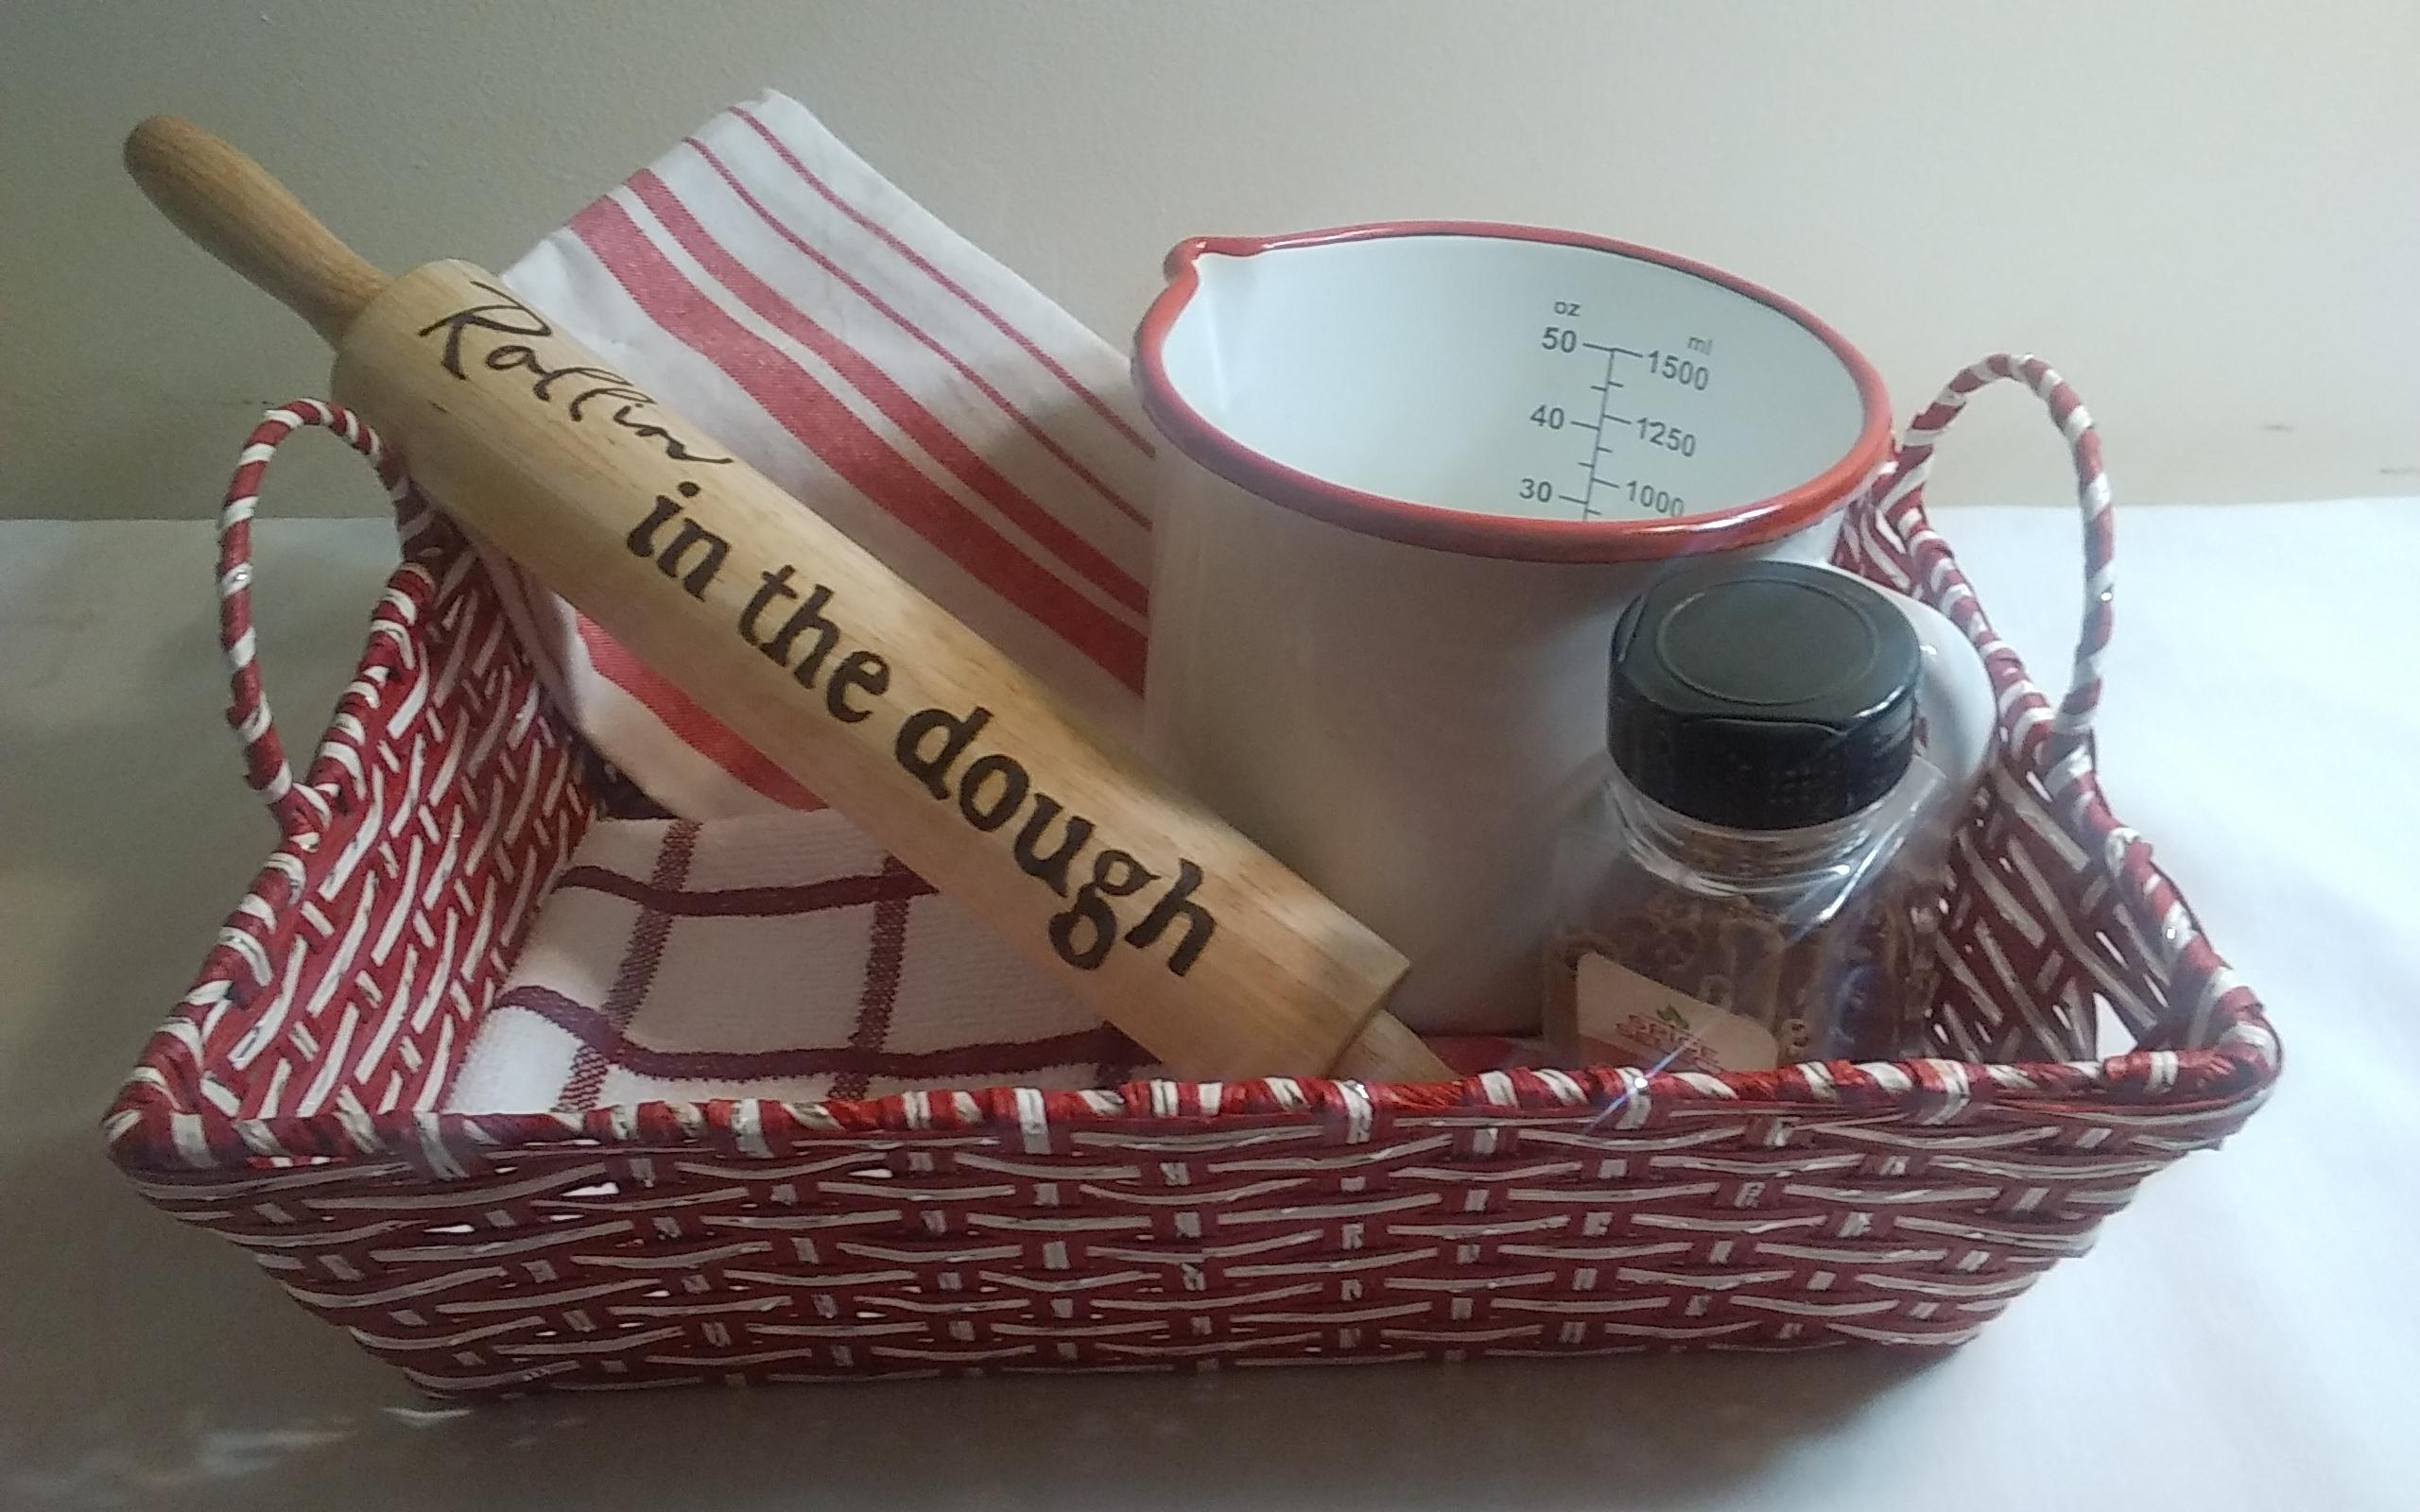 & Bakers Gift Basket by GL Treasures on Zibbet